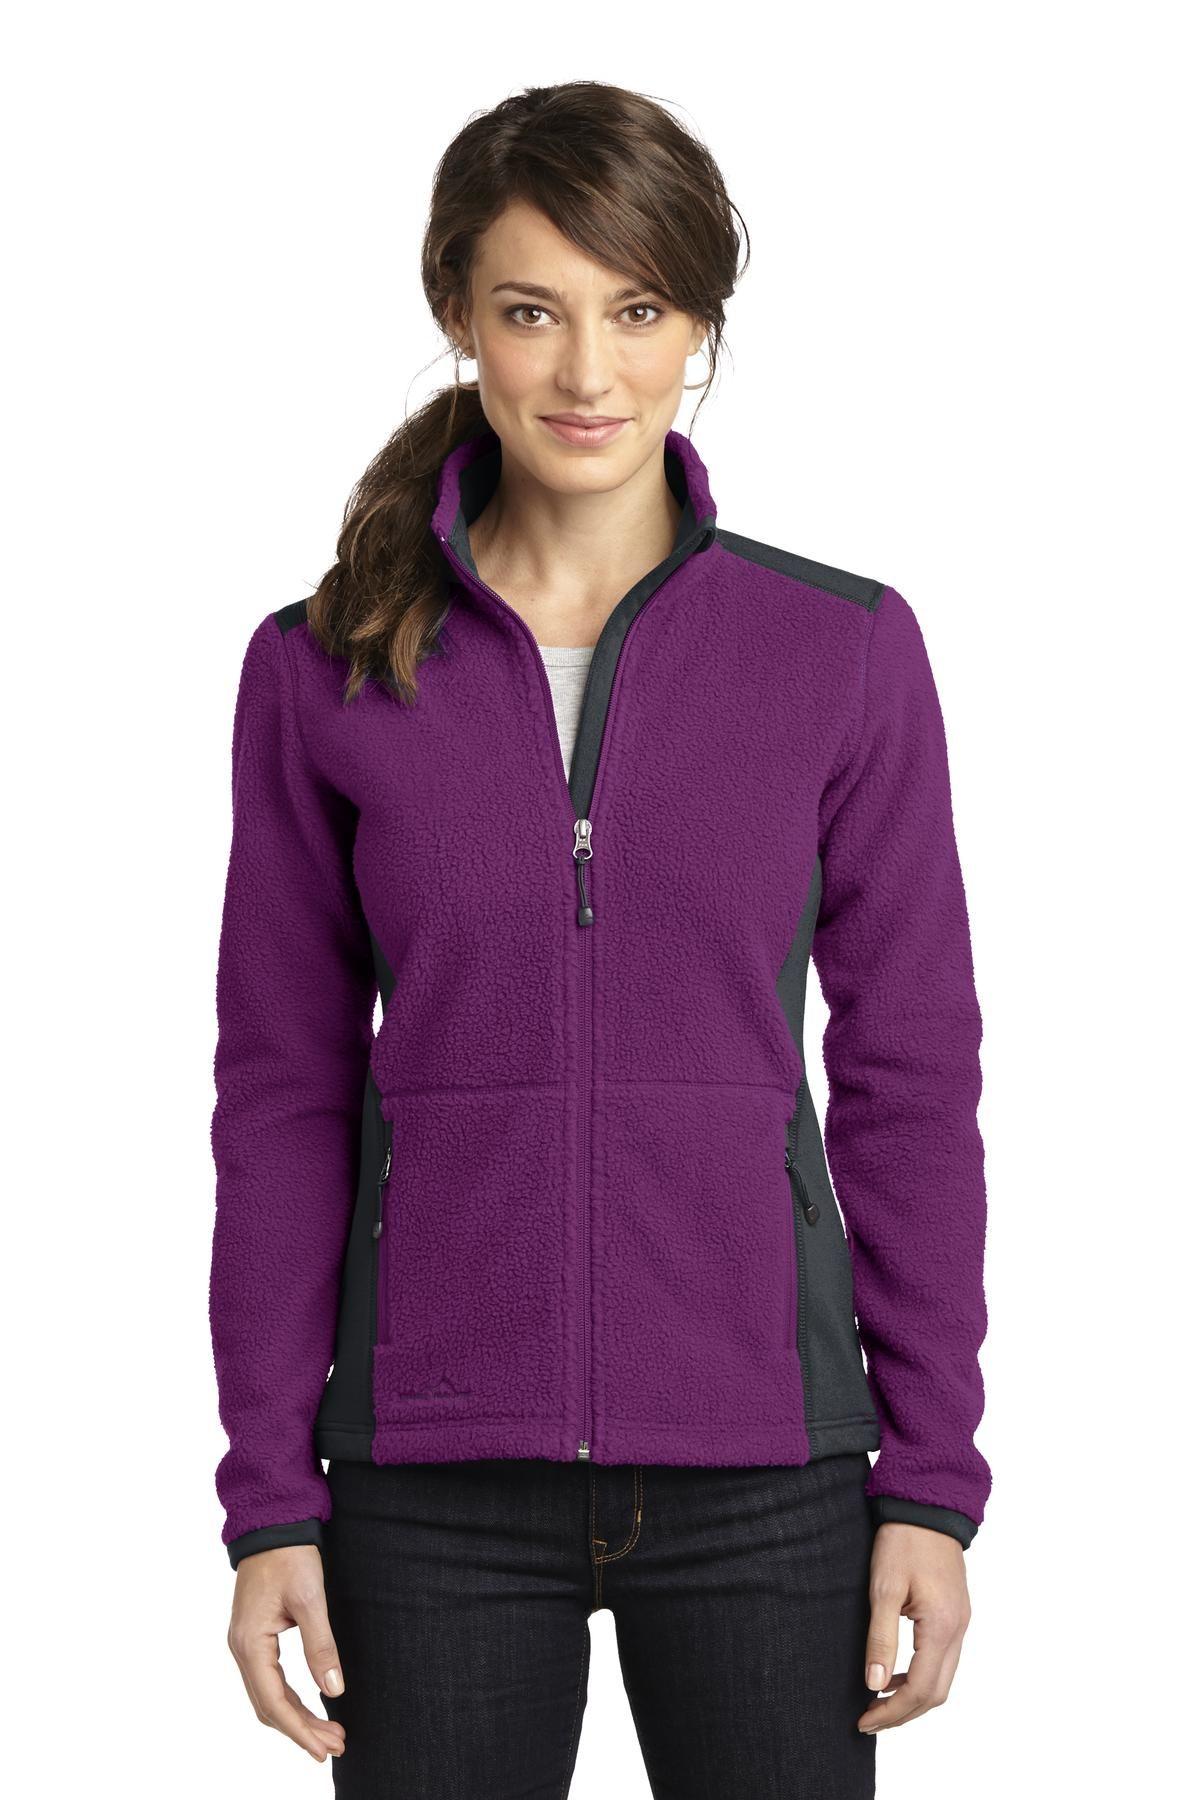 Eddie Bauer Ladies FullZip Sherpa Fleece Jacket. Plush